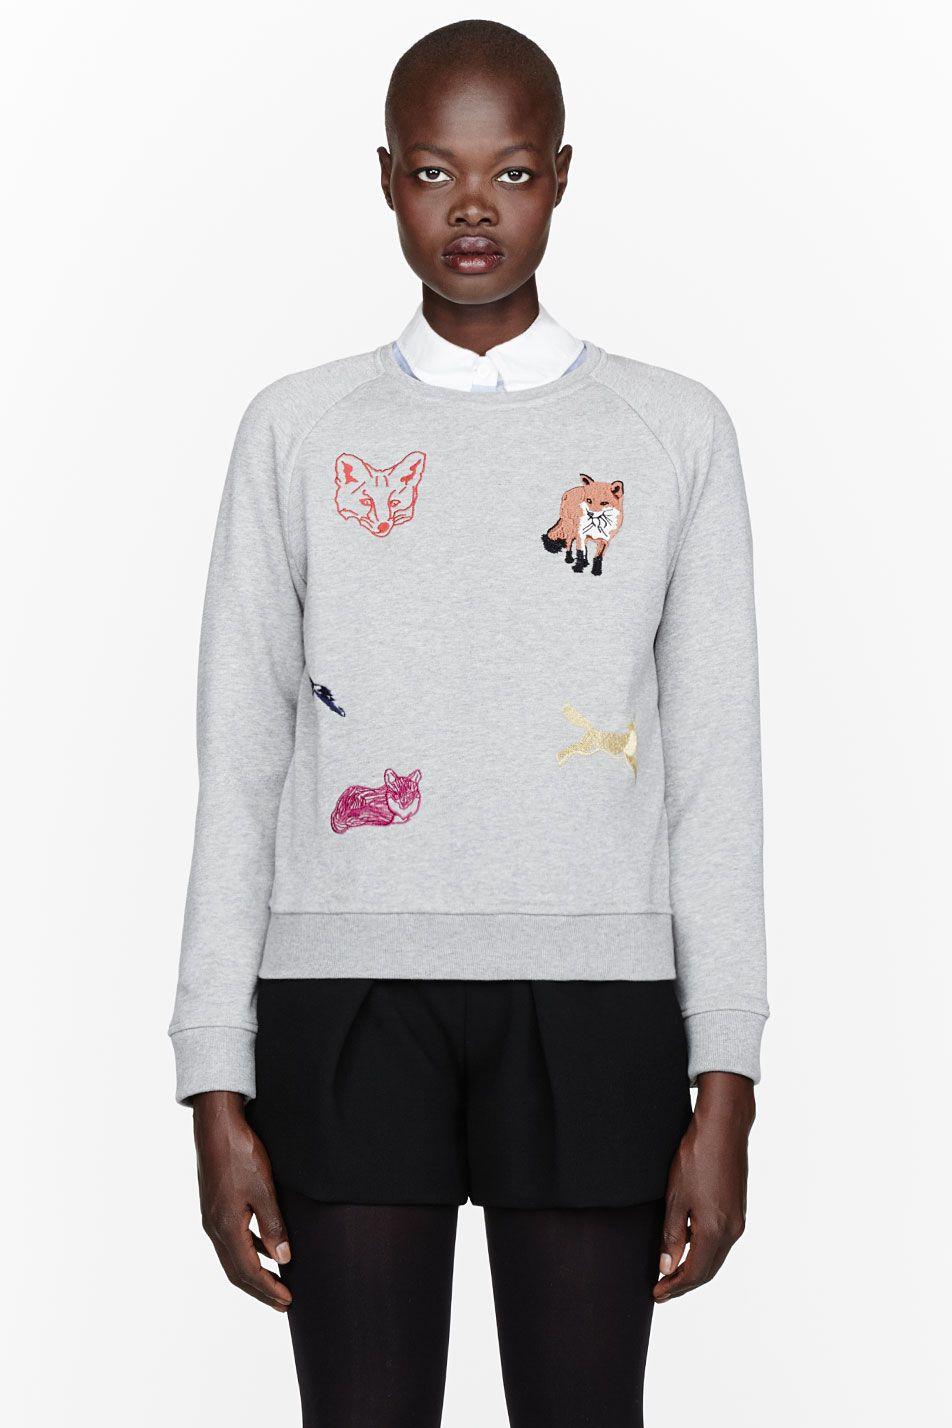 Pin By Ewa Golas On S W E A T E R W E A T H E R I S B E T T E R W E A T H E R Chic Sweatshirt Print Textiles Fashion Fashion Artwork [ 1428 x 952 Pixel ]